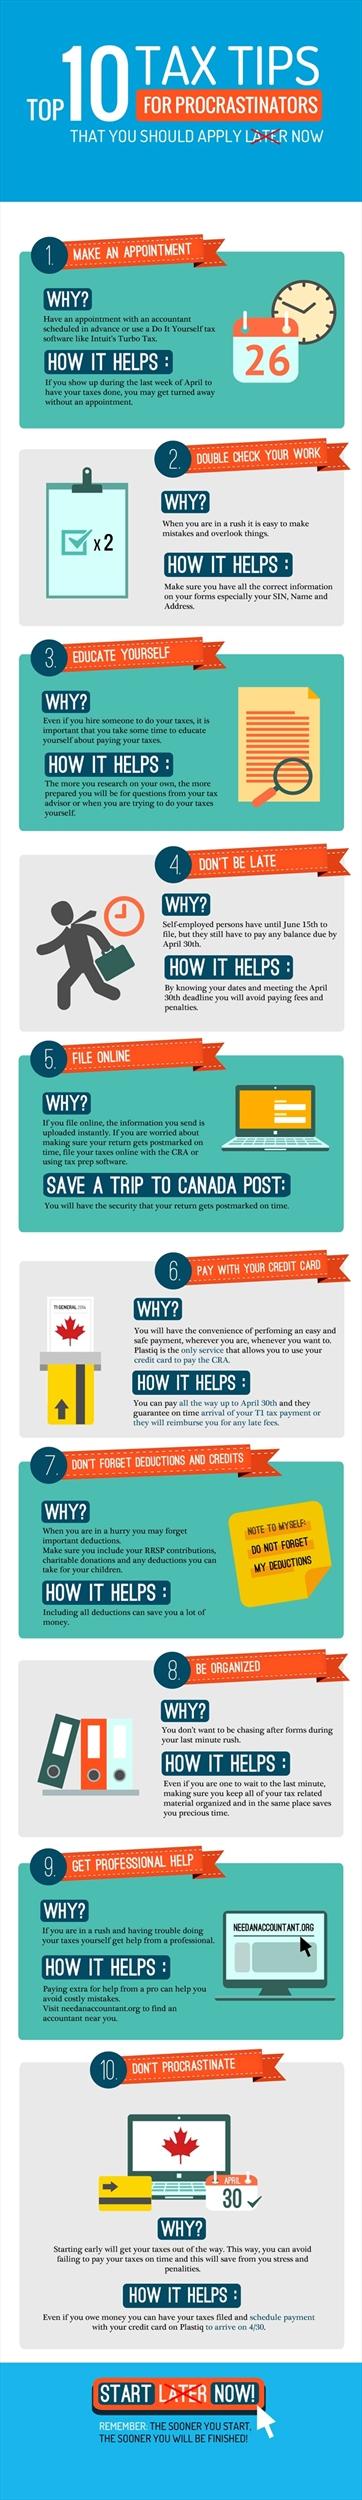 Tax tips for procrastinators infographic